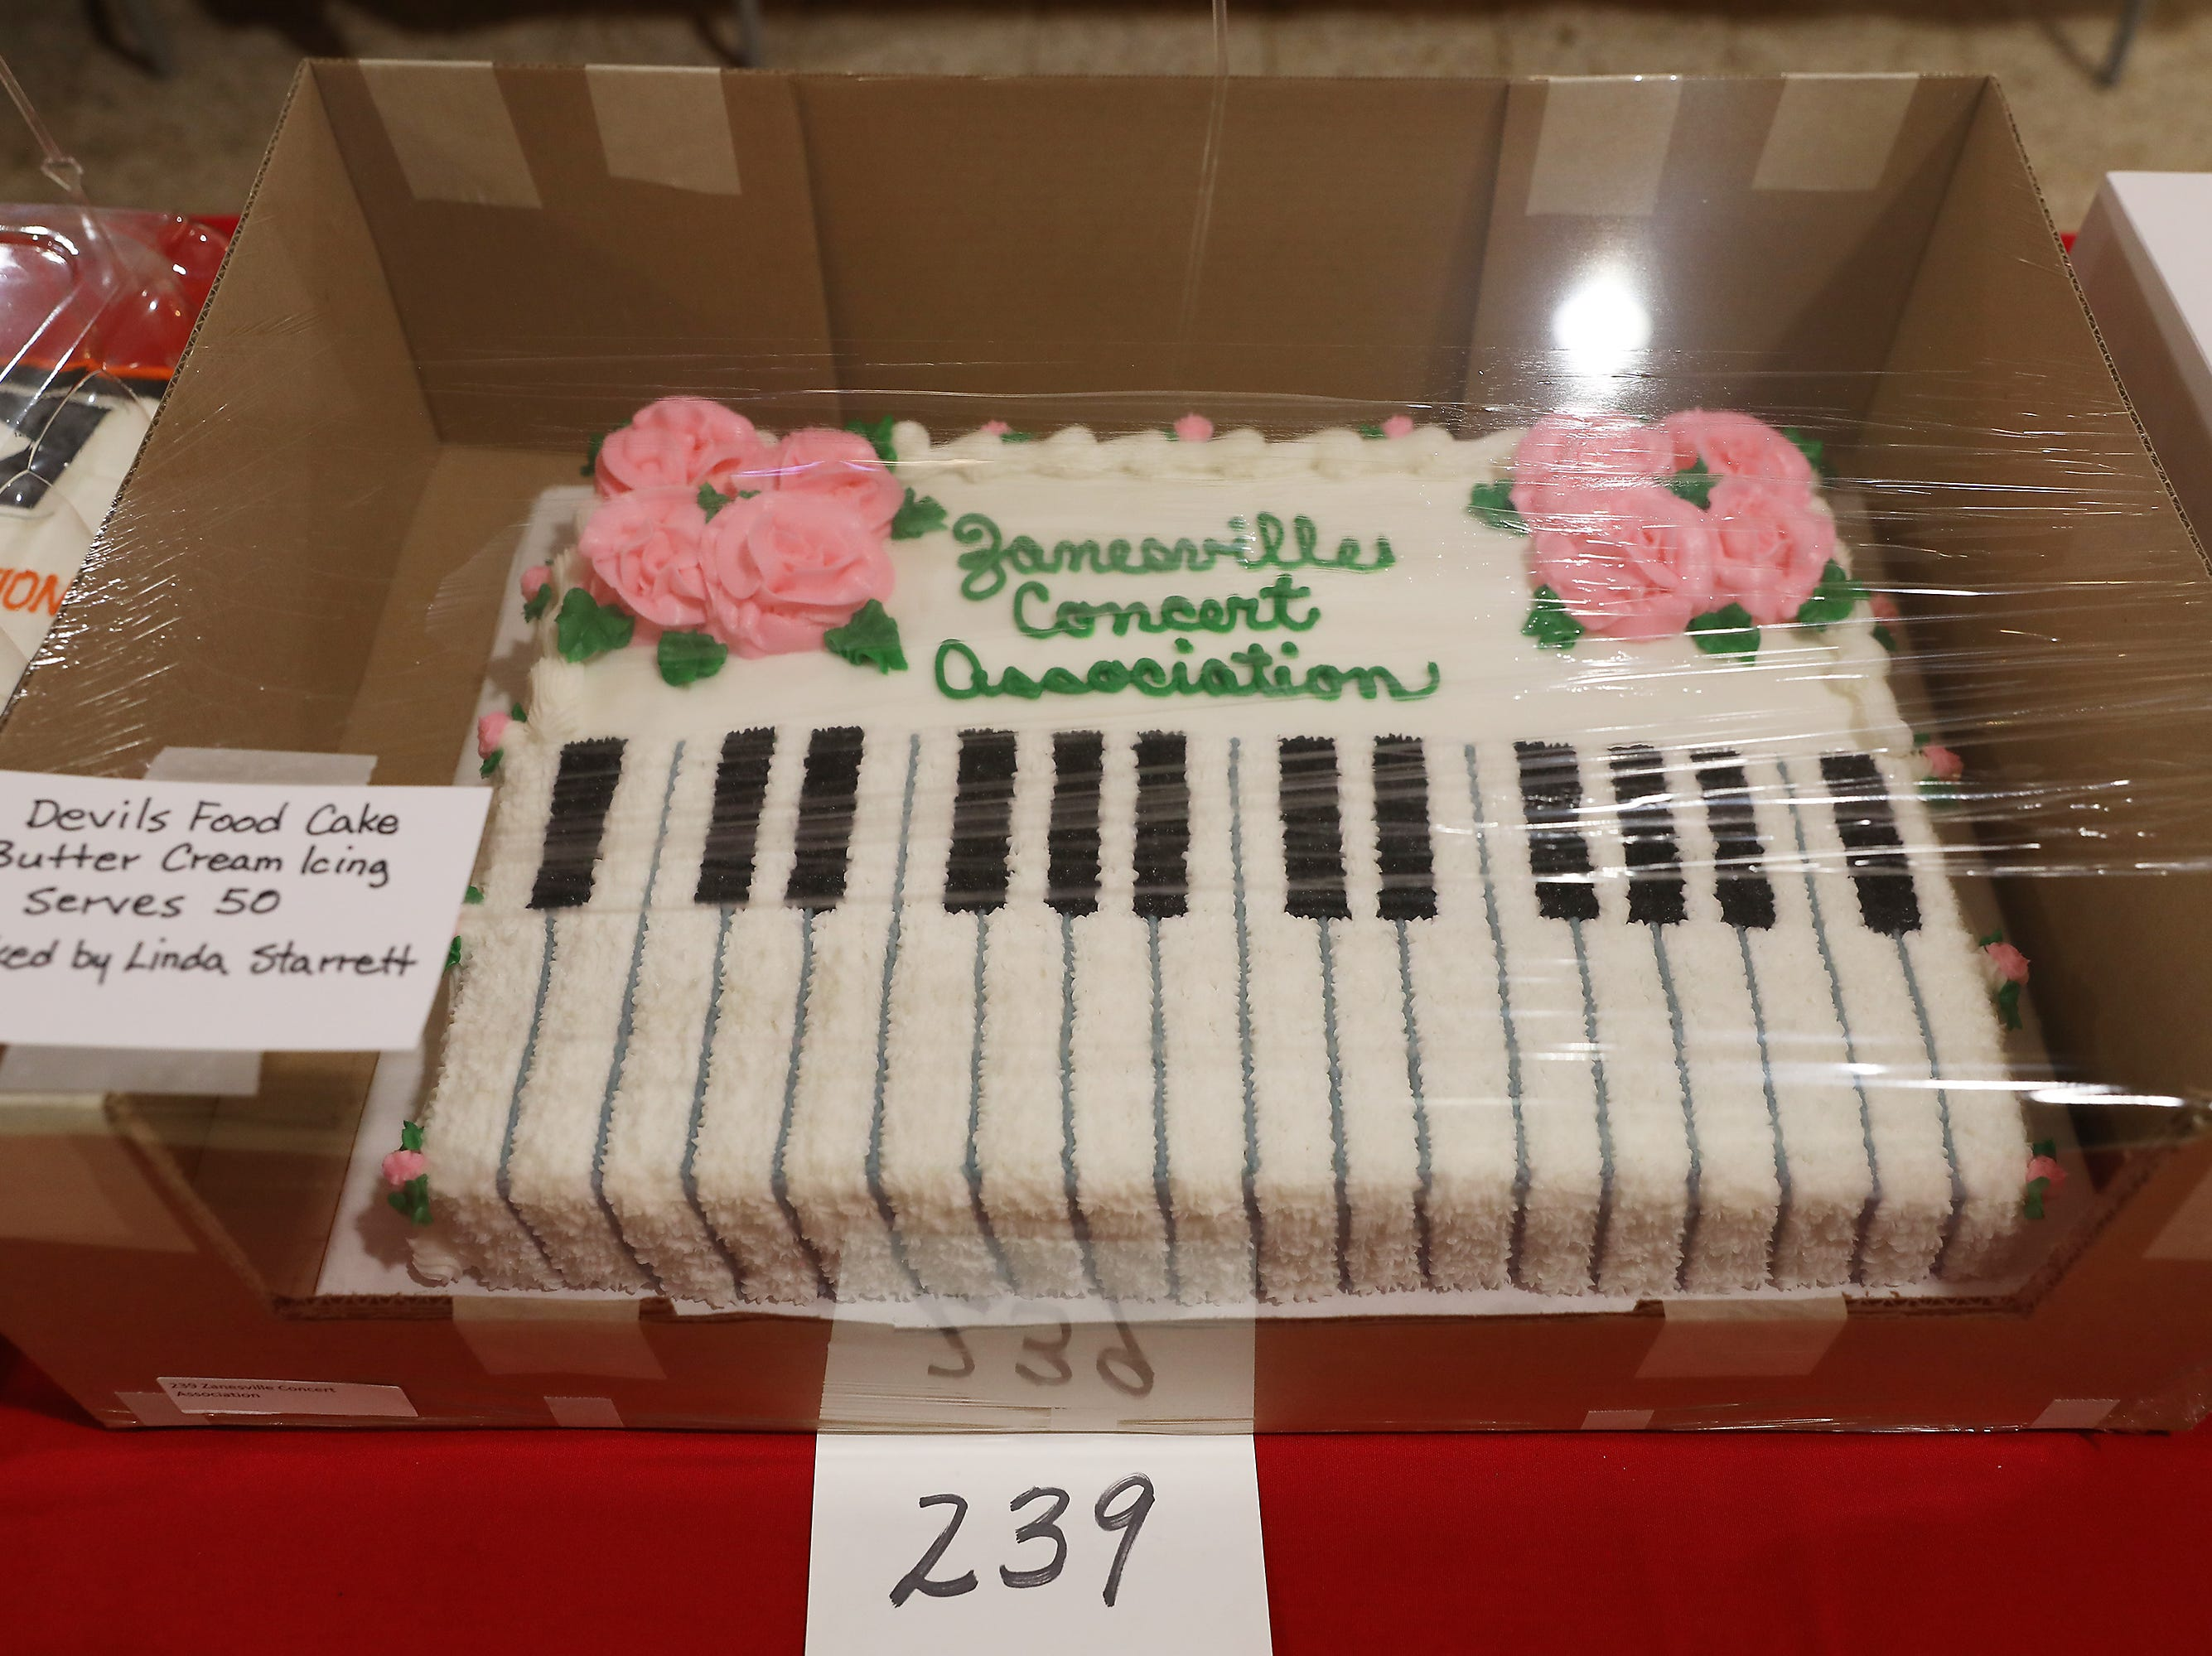 9:30 A.M. Friday cake 239 Zanesville Concert Association - 2 season passes; $130